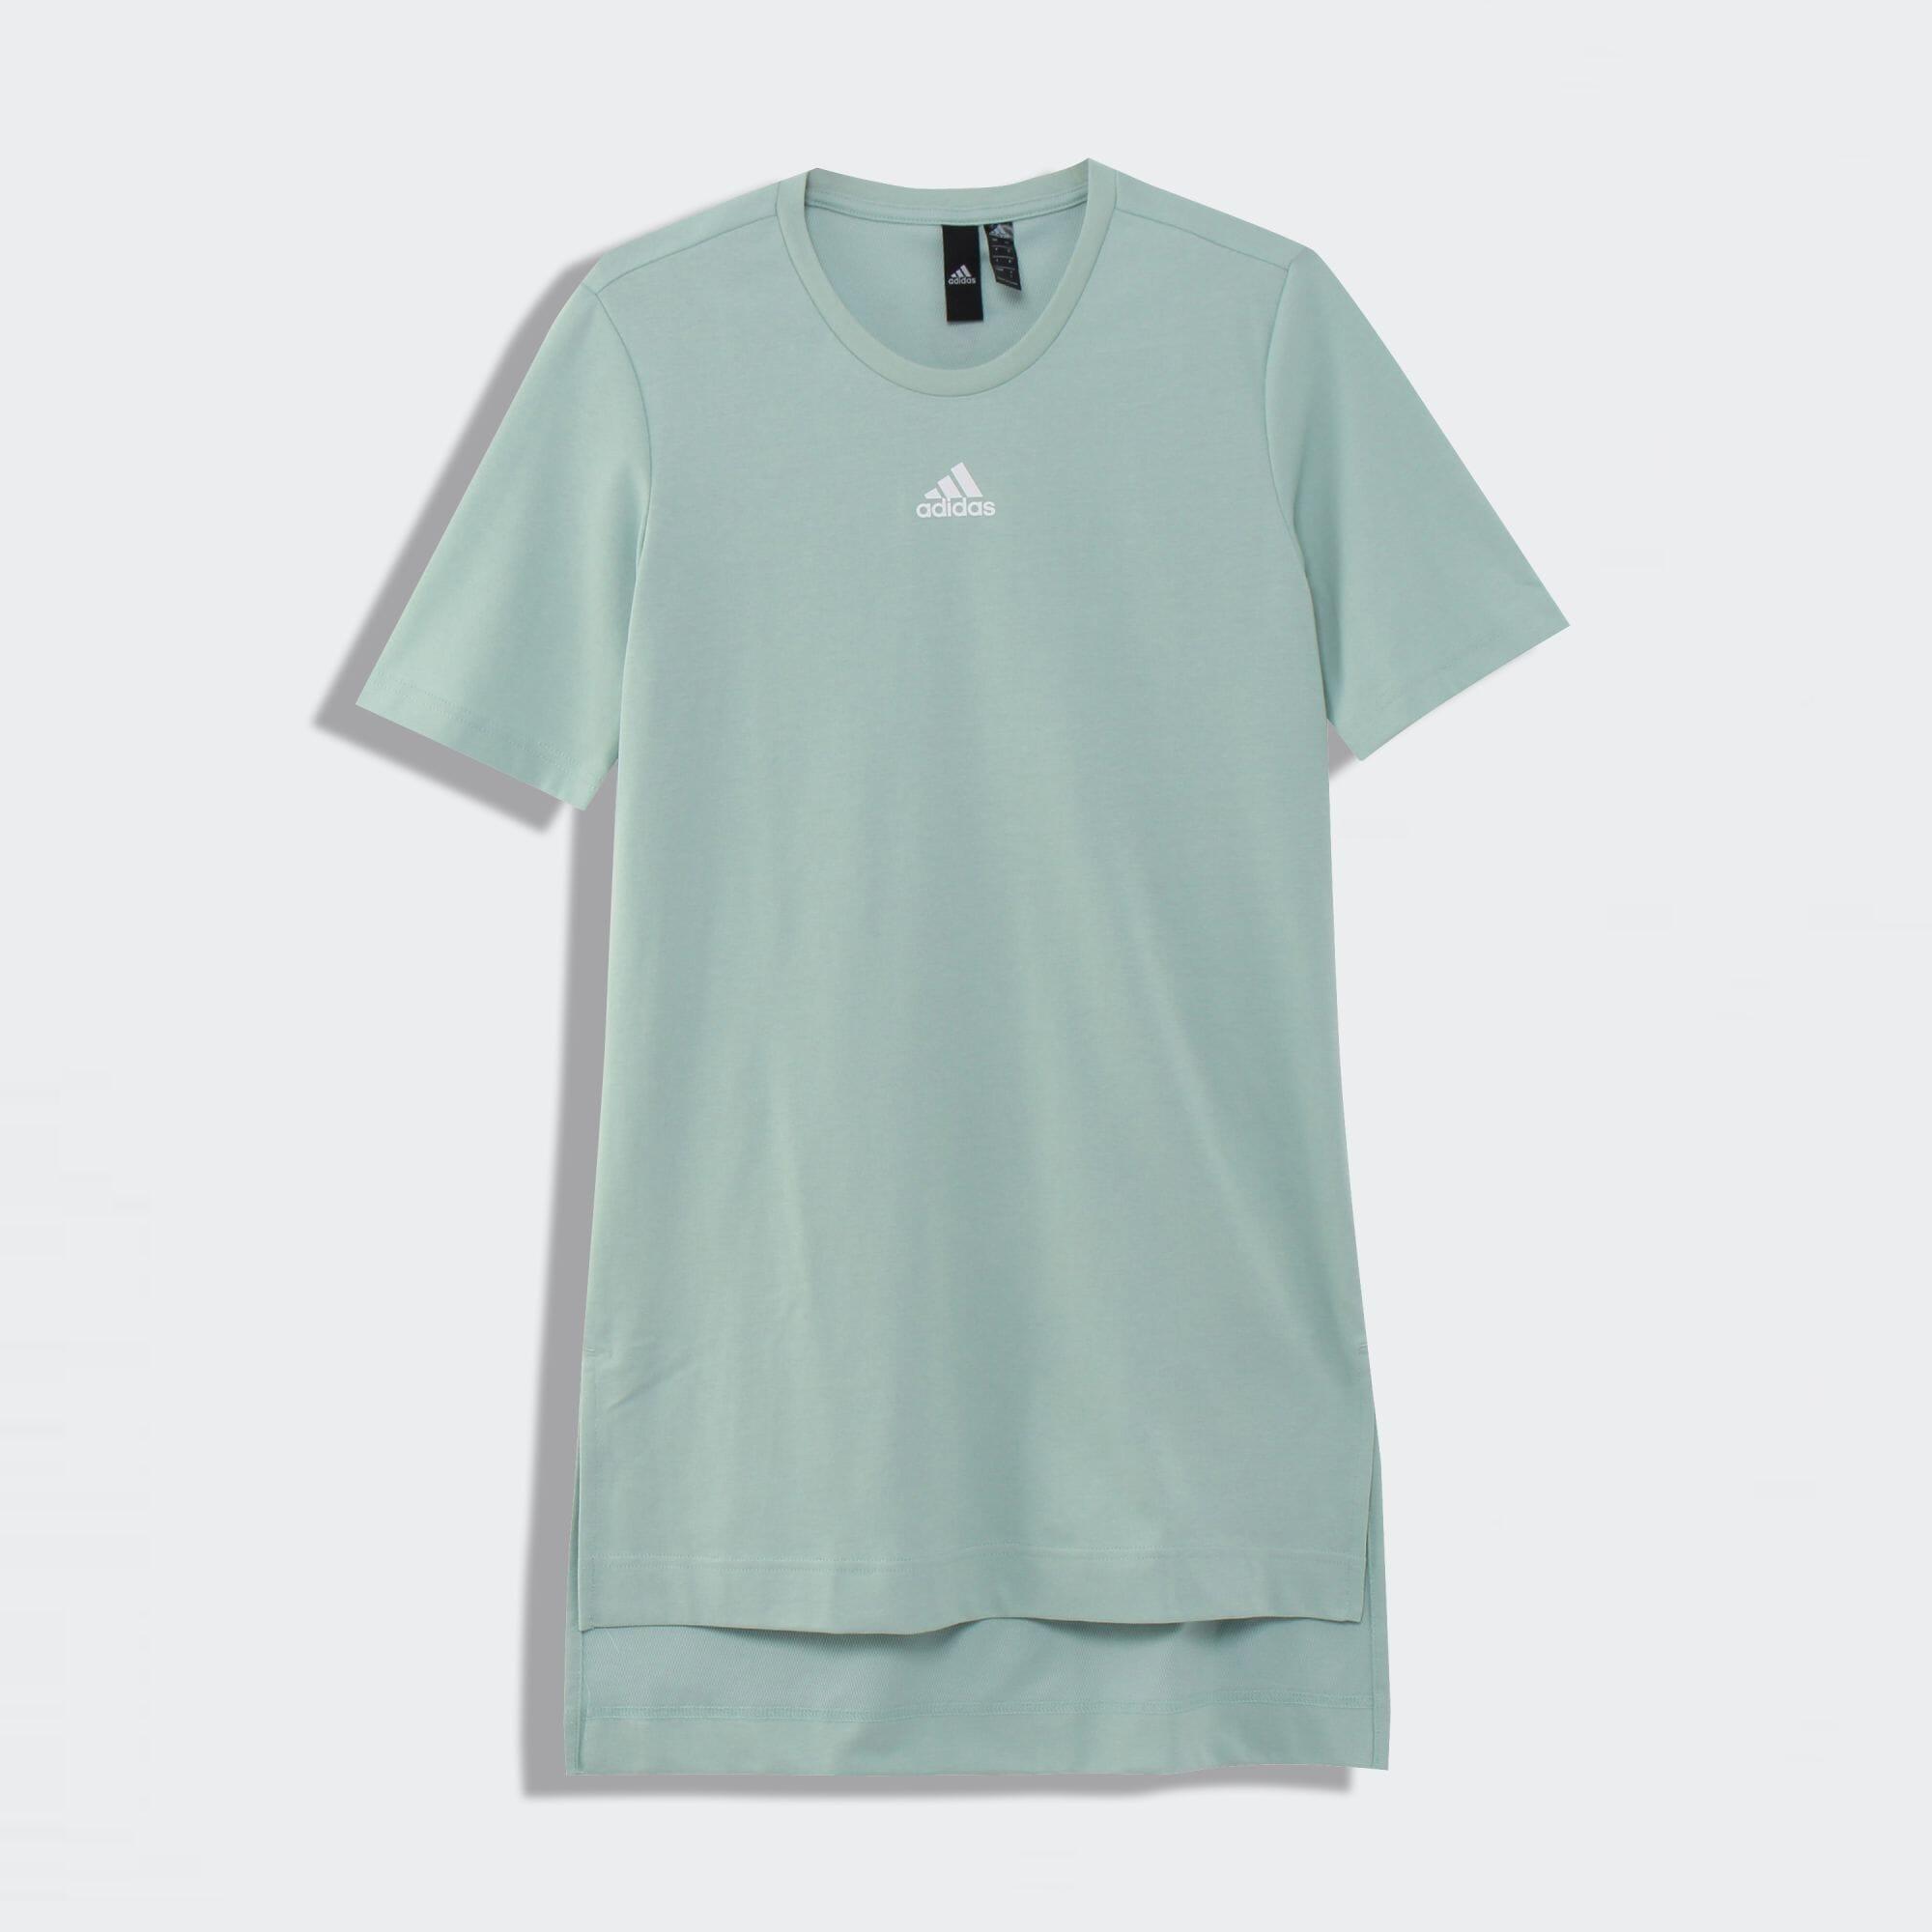 ID ロング Tシャツ / ID Long Tee